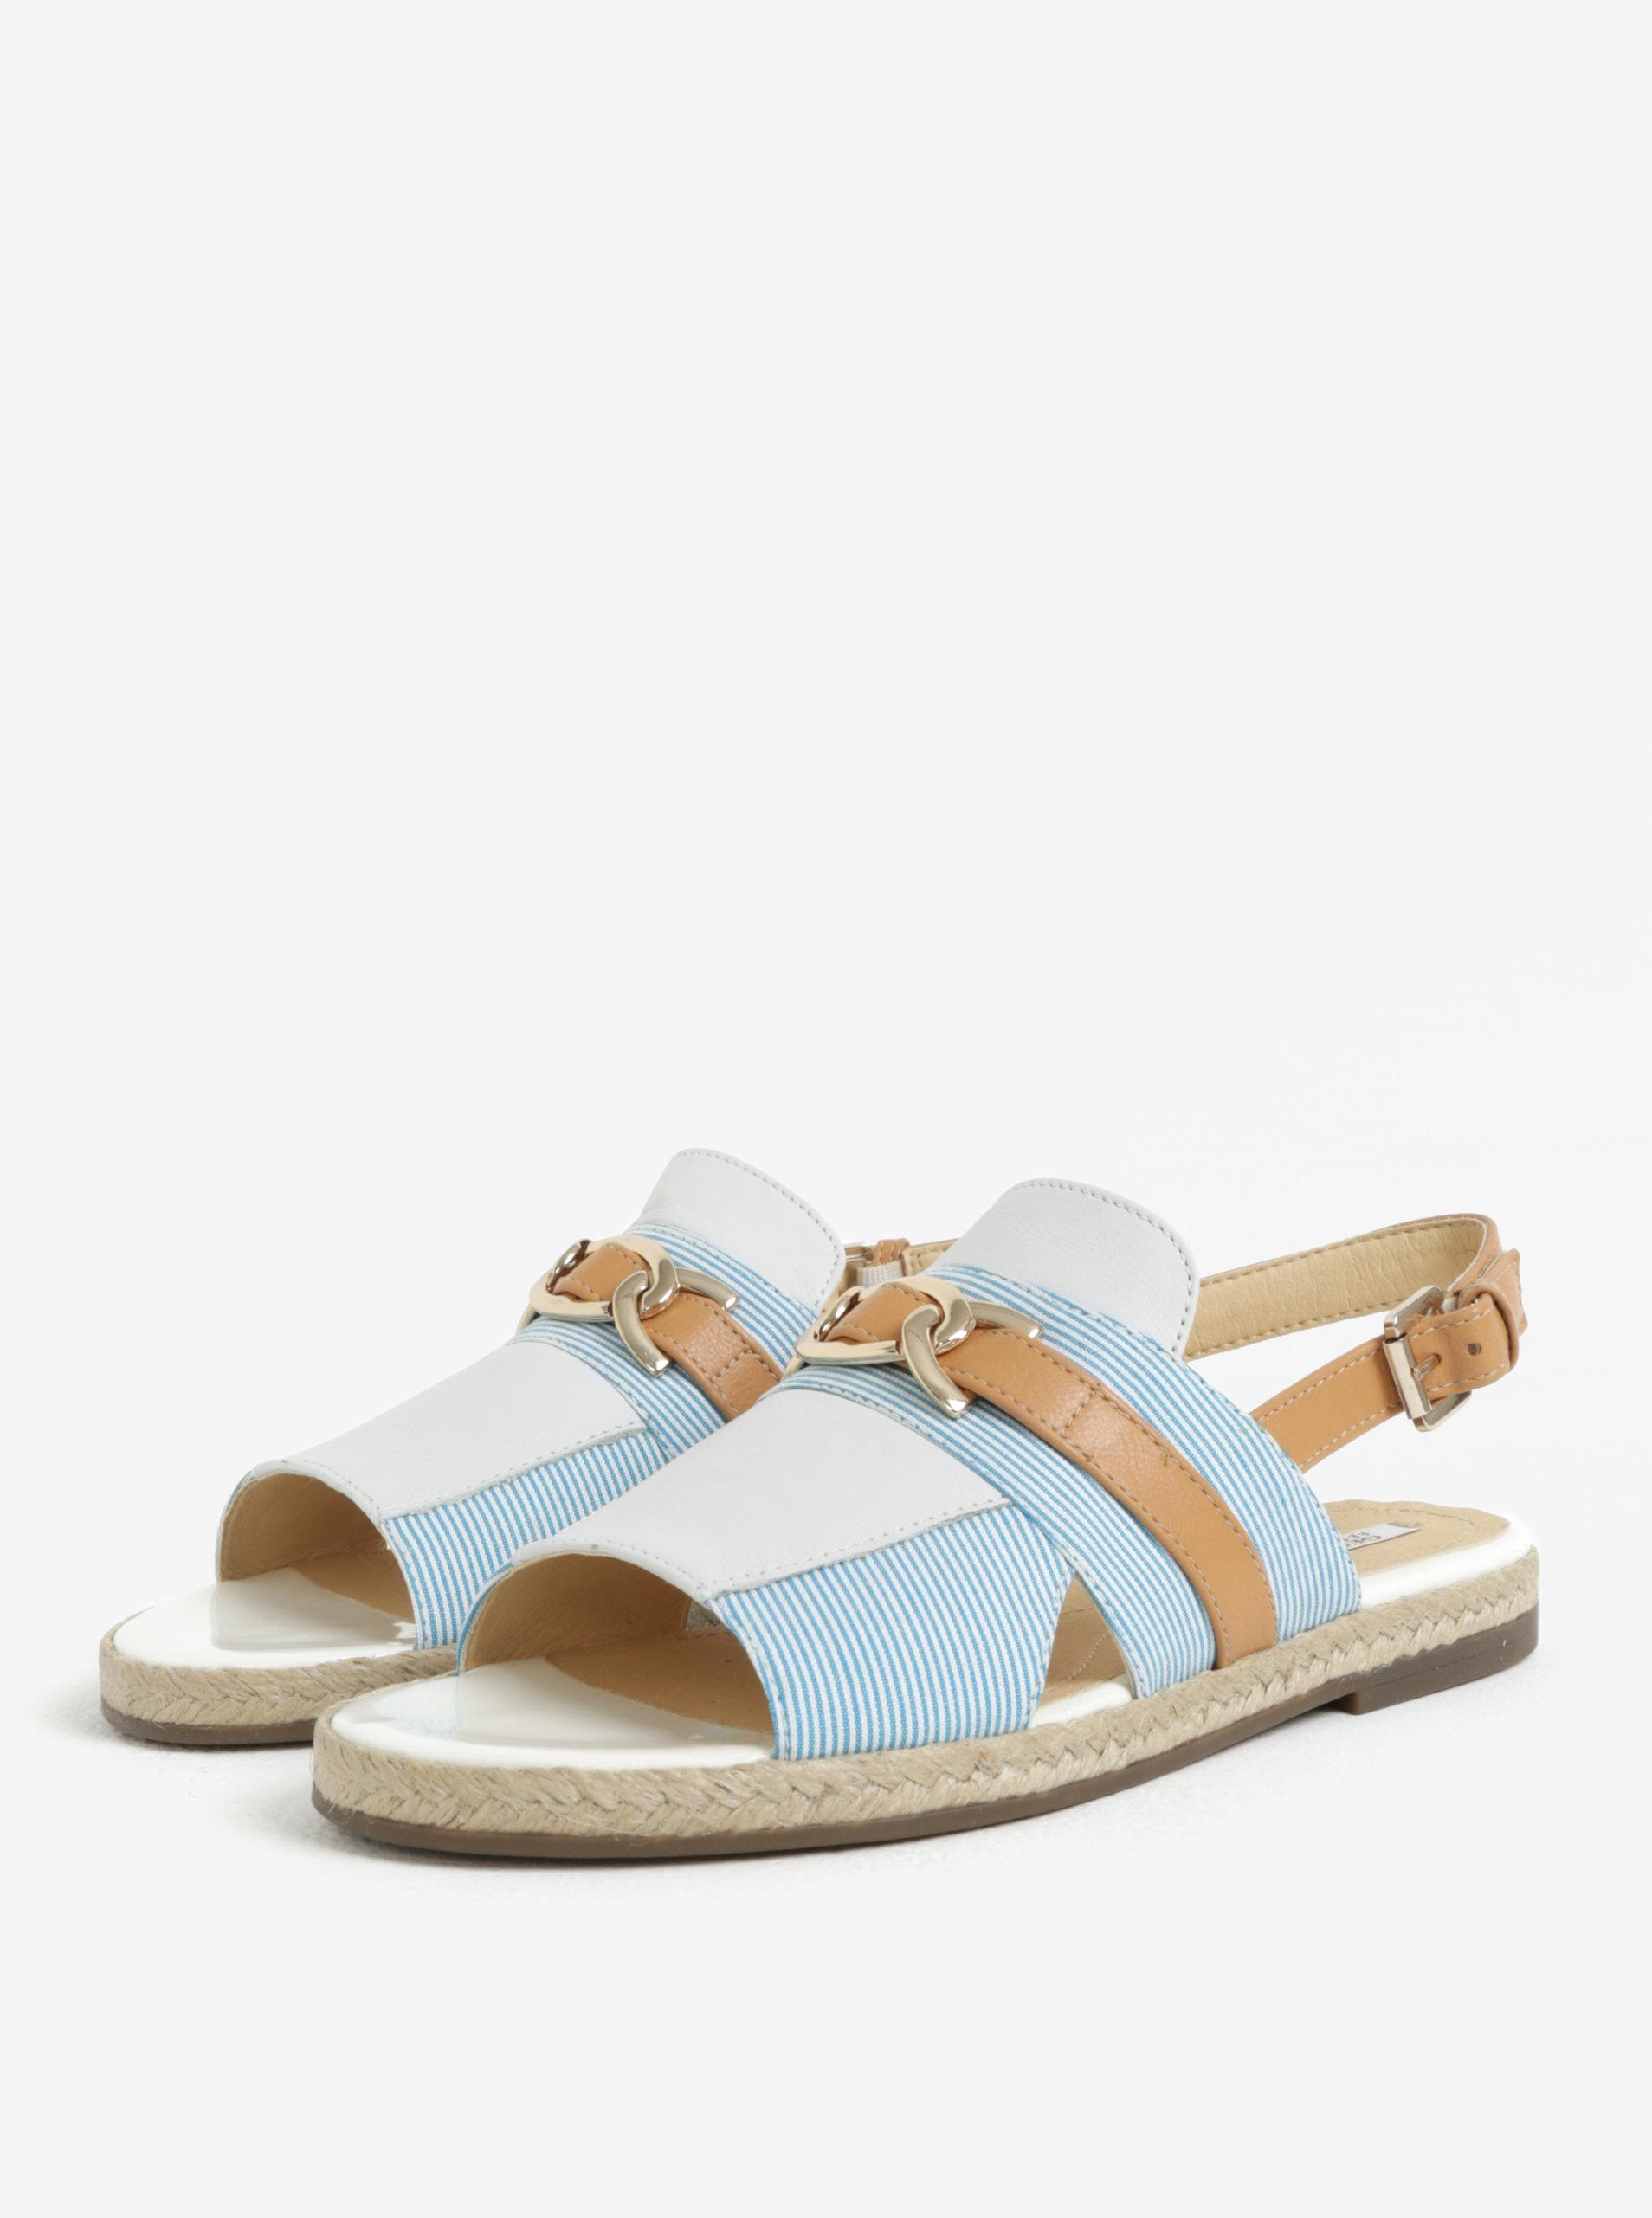 Hnědo-modré dámské sandály Geox Mary Kolleen ... 0fb233e002